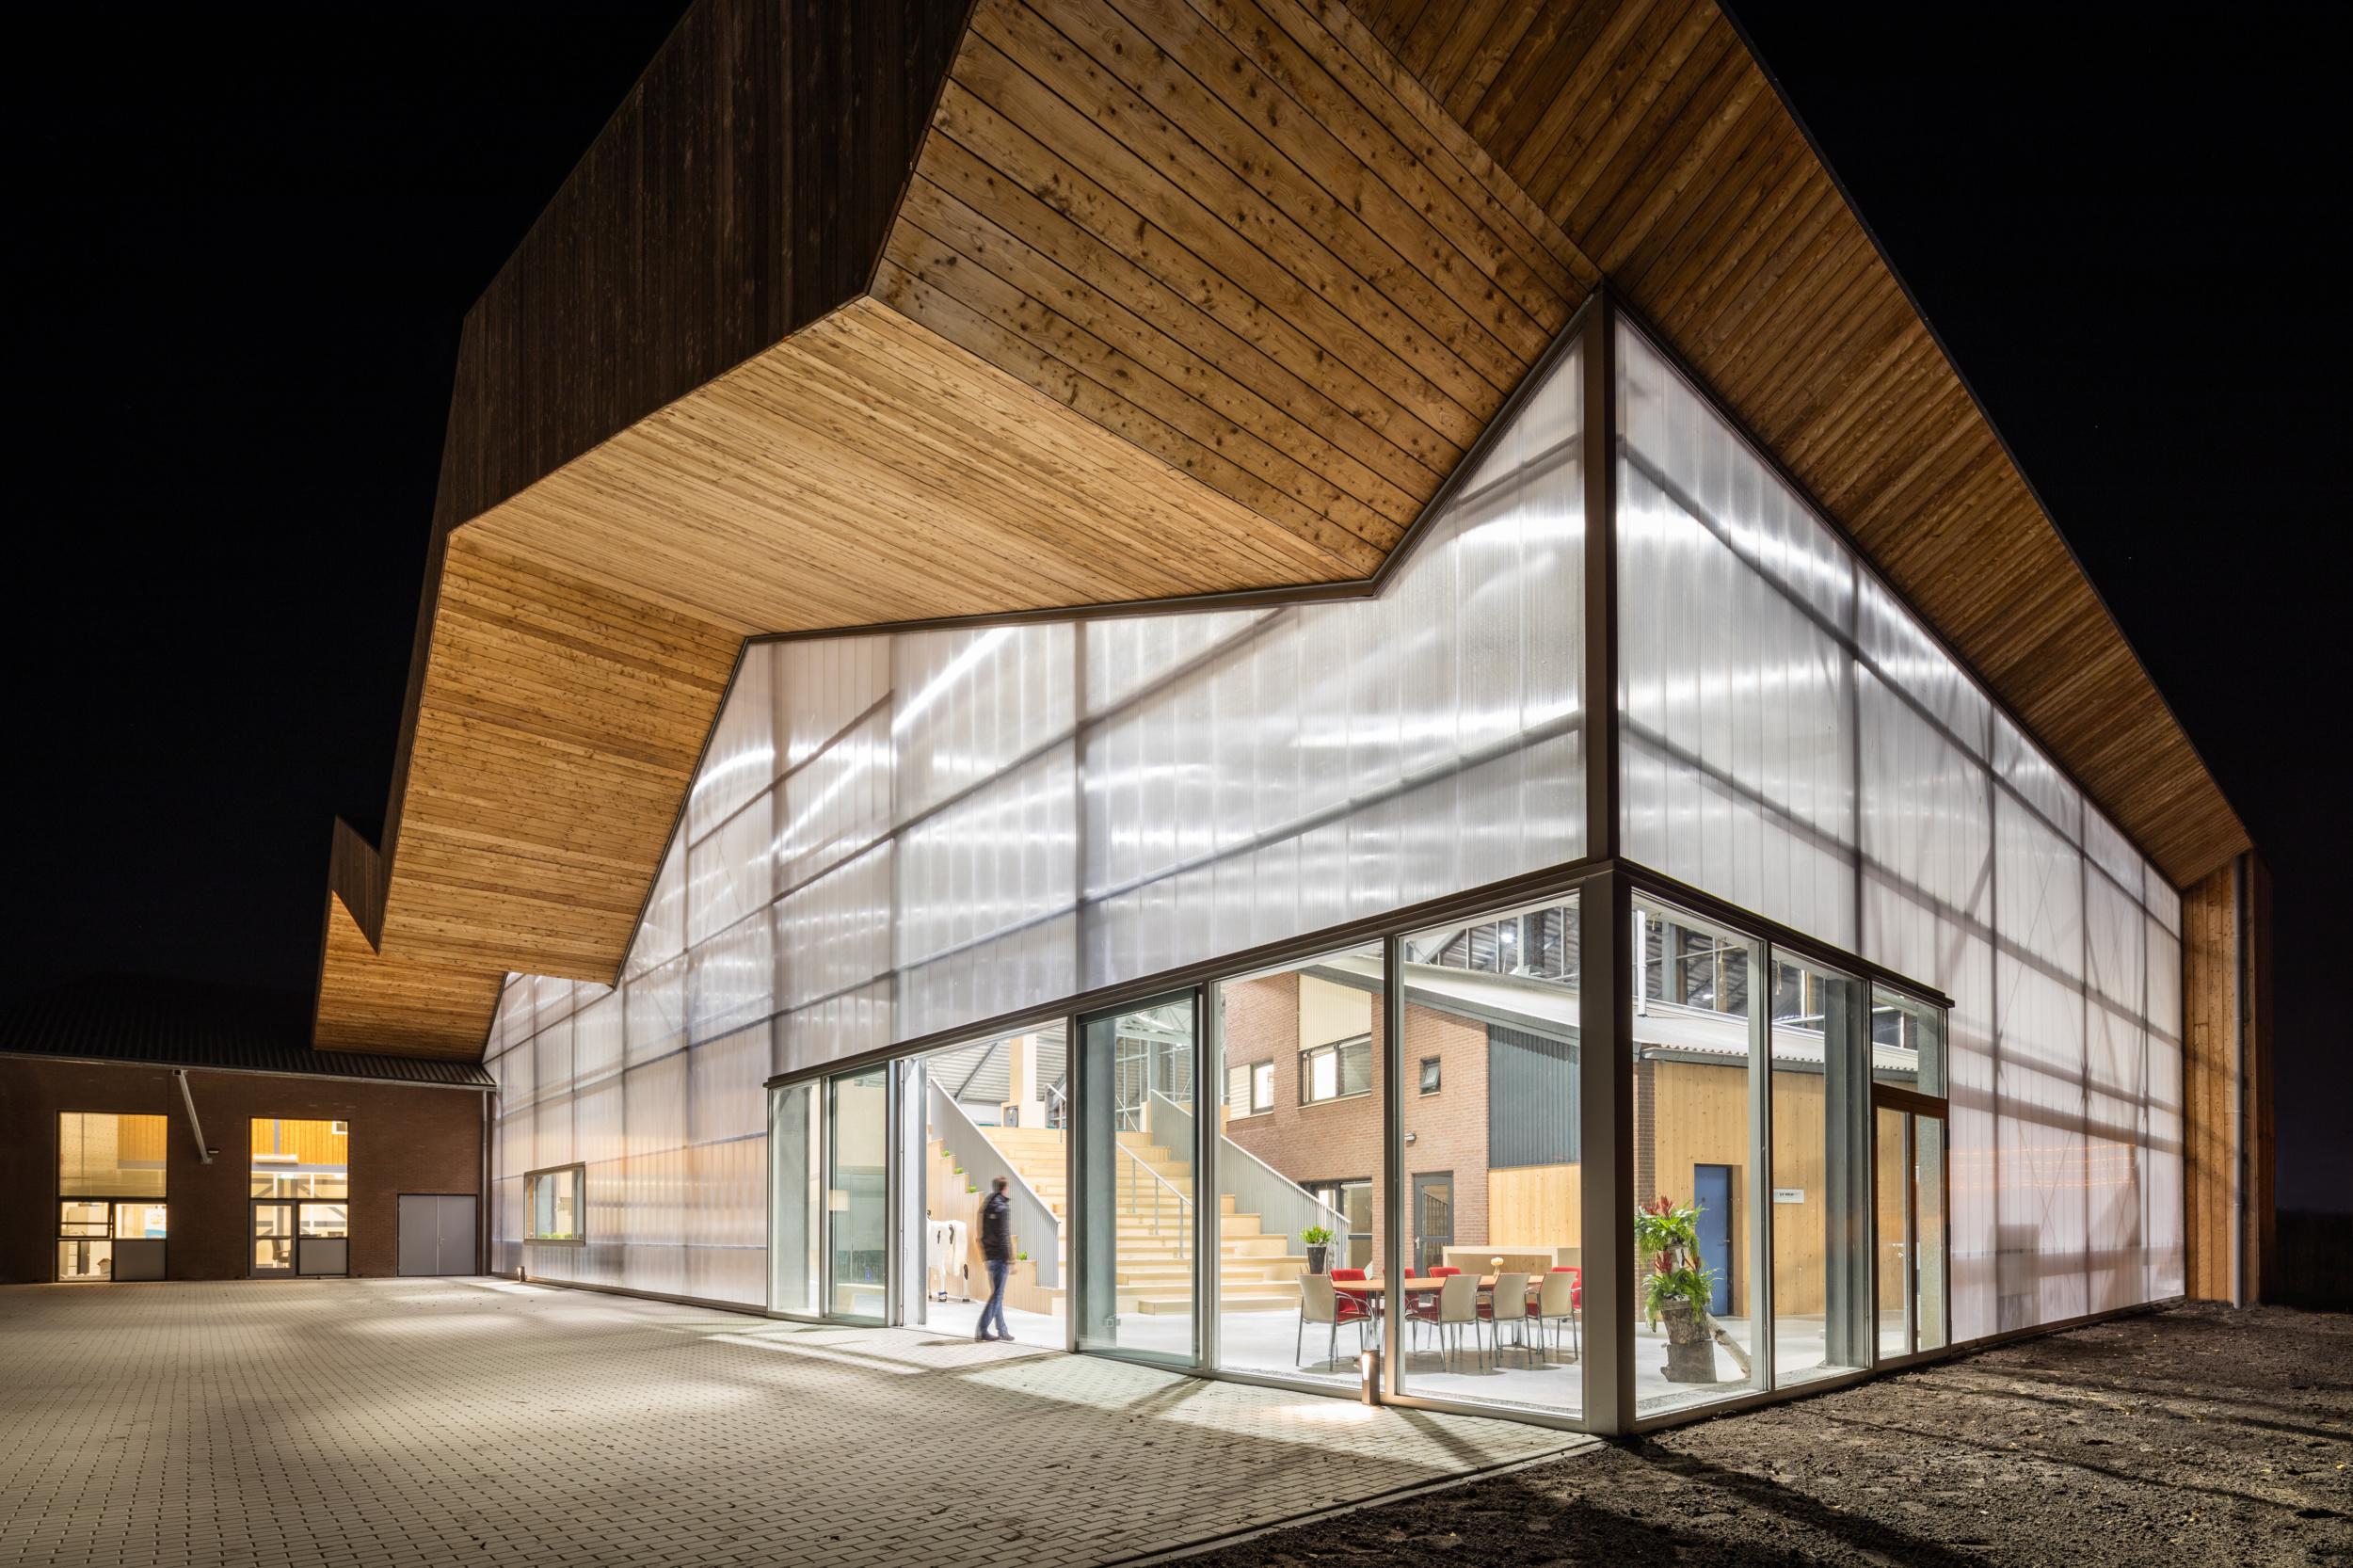 Dairy Campus, Leeuwarden - Arcadis, Chiel de Nooyer architectuurfotograaf